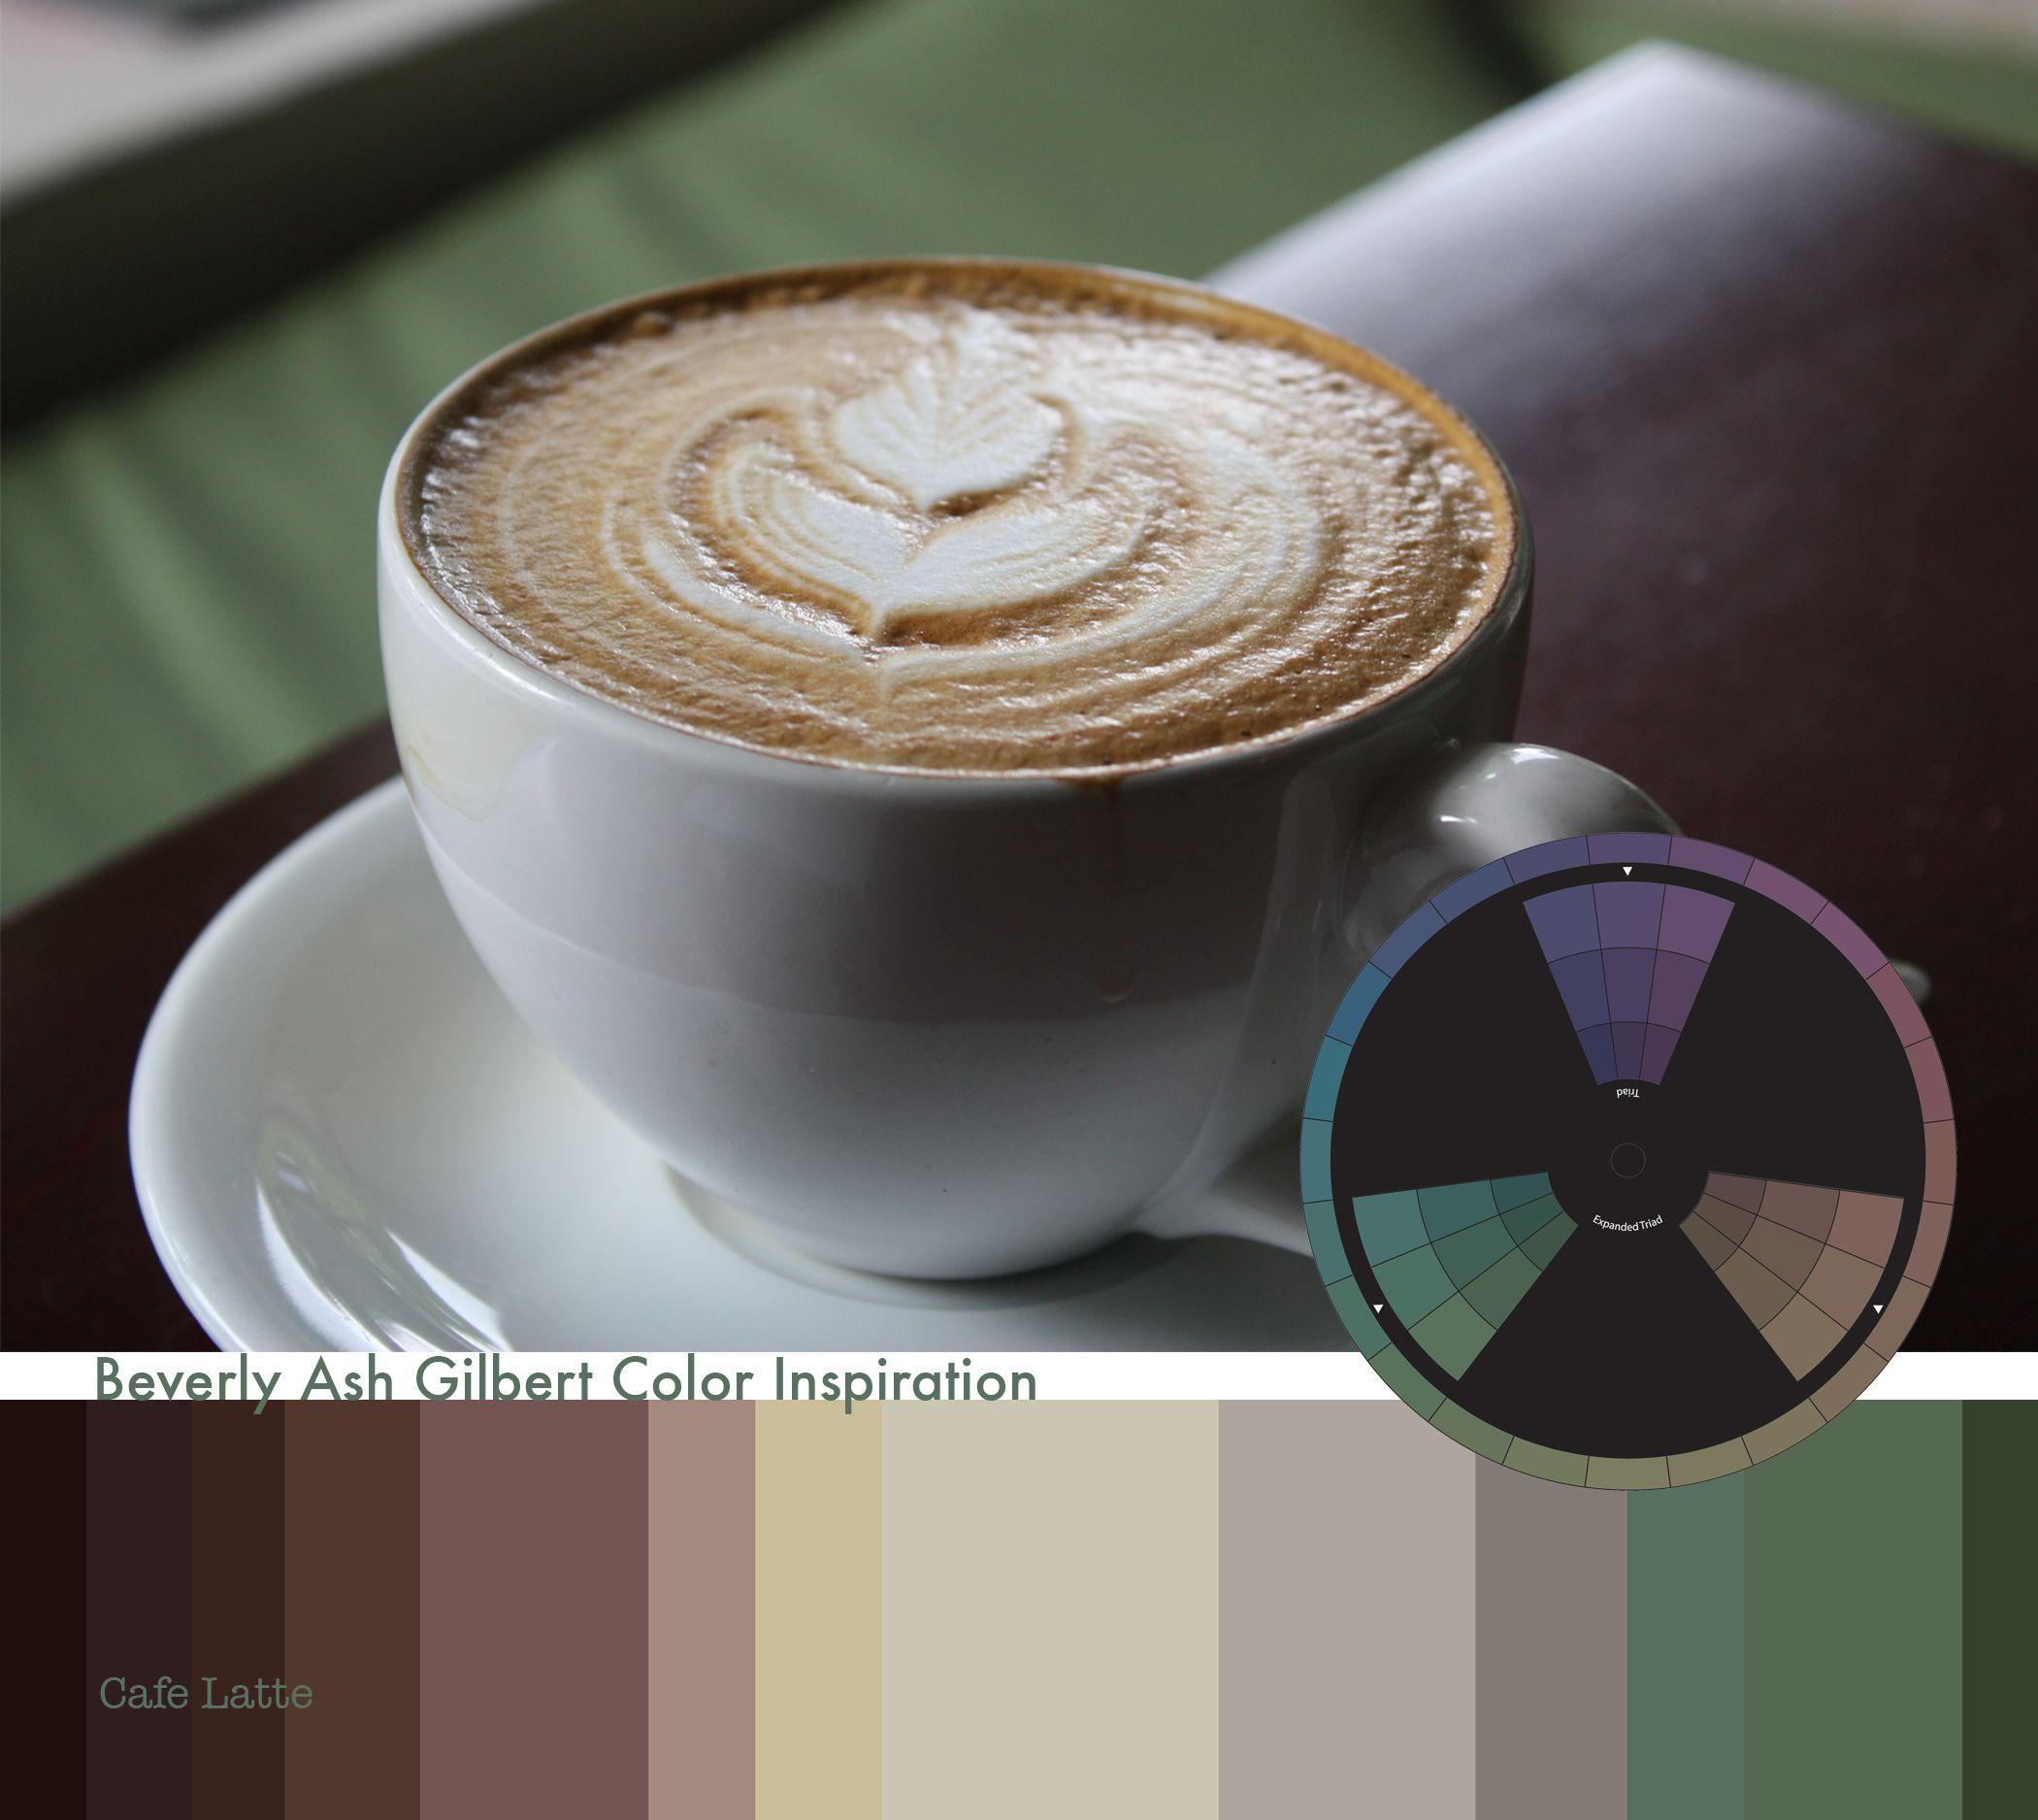 Color Inspiration all around! Artful Color Inspiration, Cafe Latte, #colorinspiration